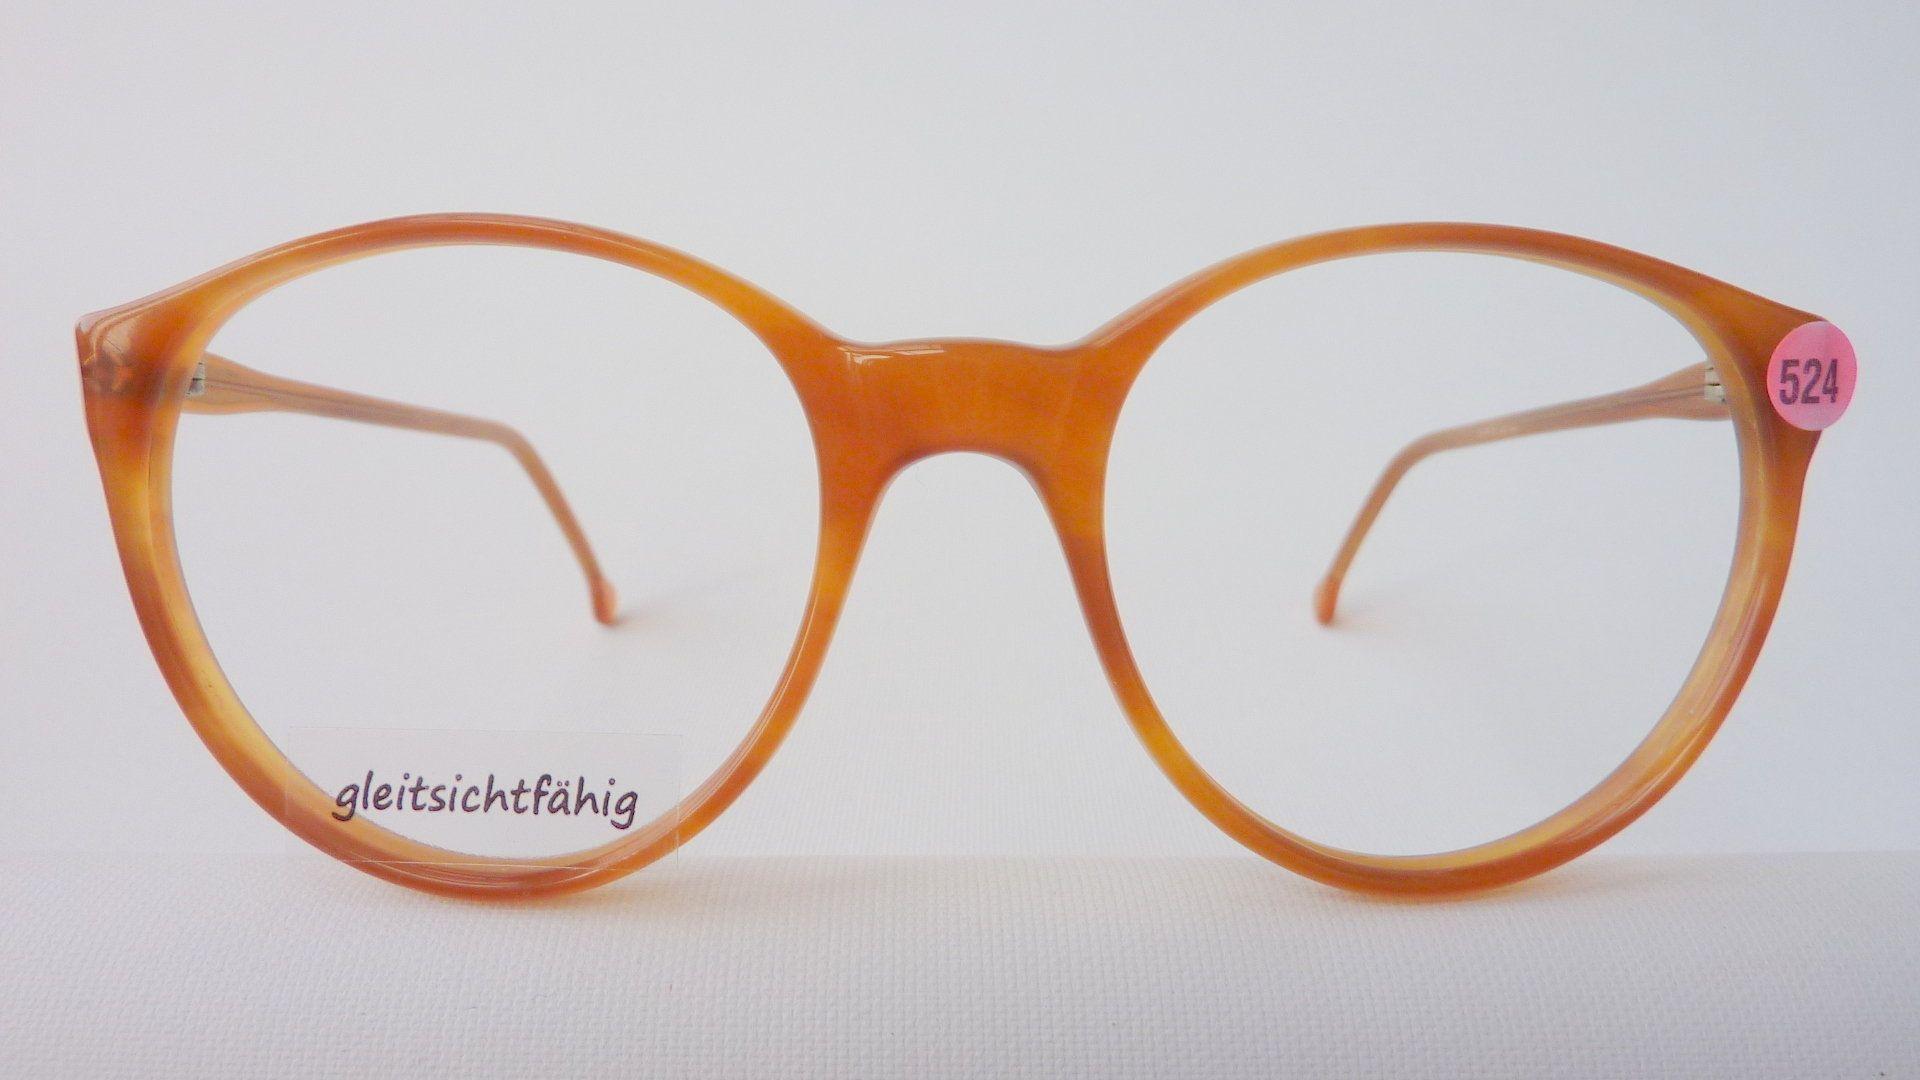 Meitzner Brille grosse Pantoform 80s caramellbraun | Sehhilfe ...